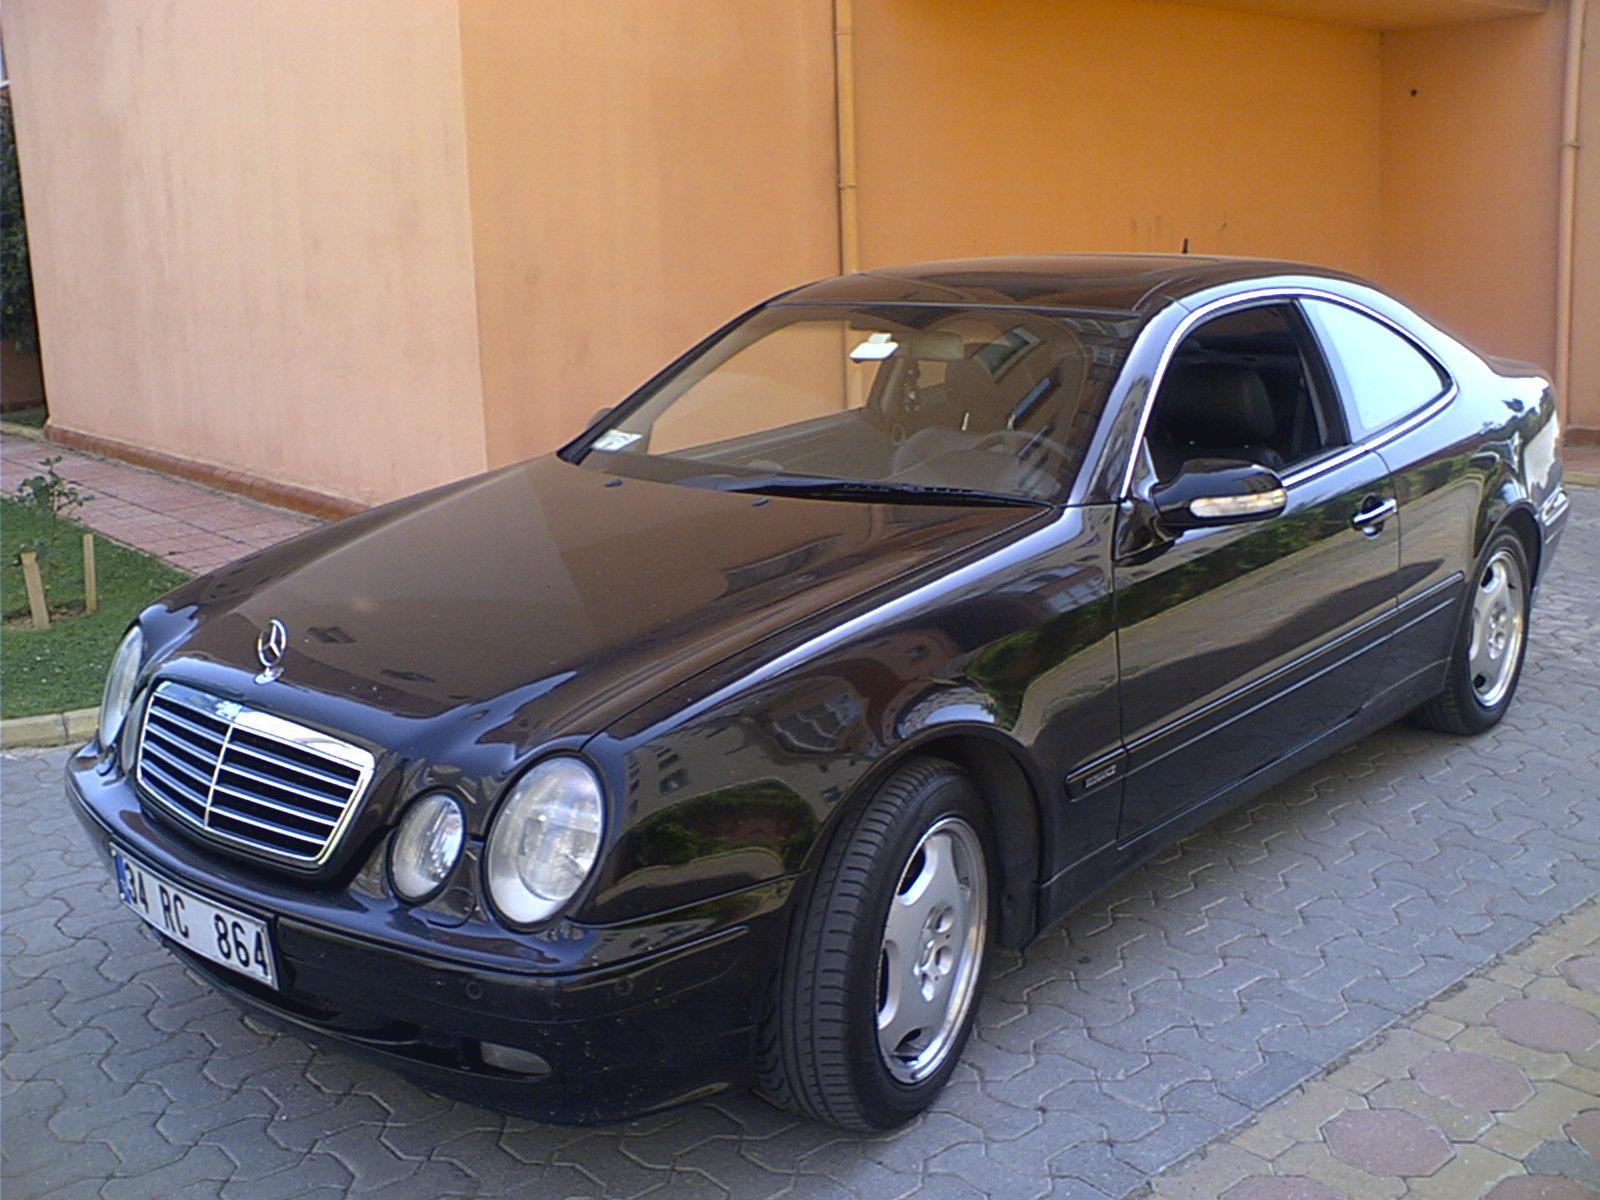 2000 Mercedes-Benz CLK-Class VIN Number Search - AutoDetective